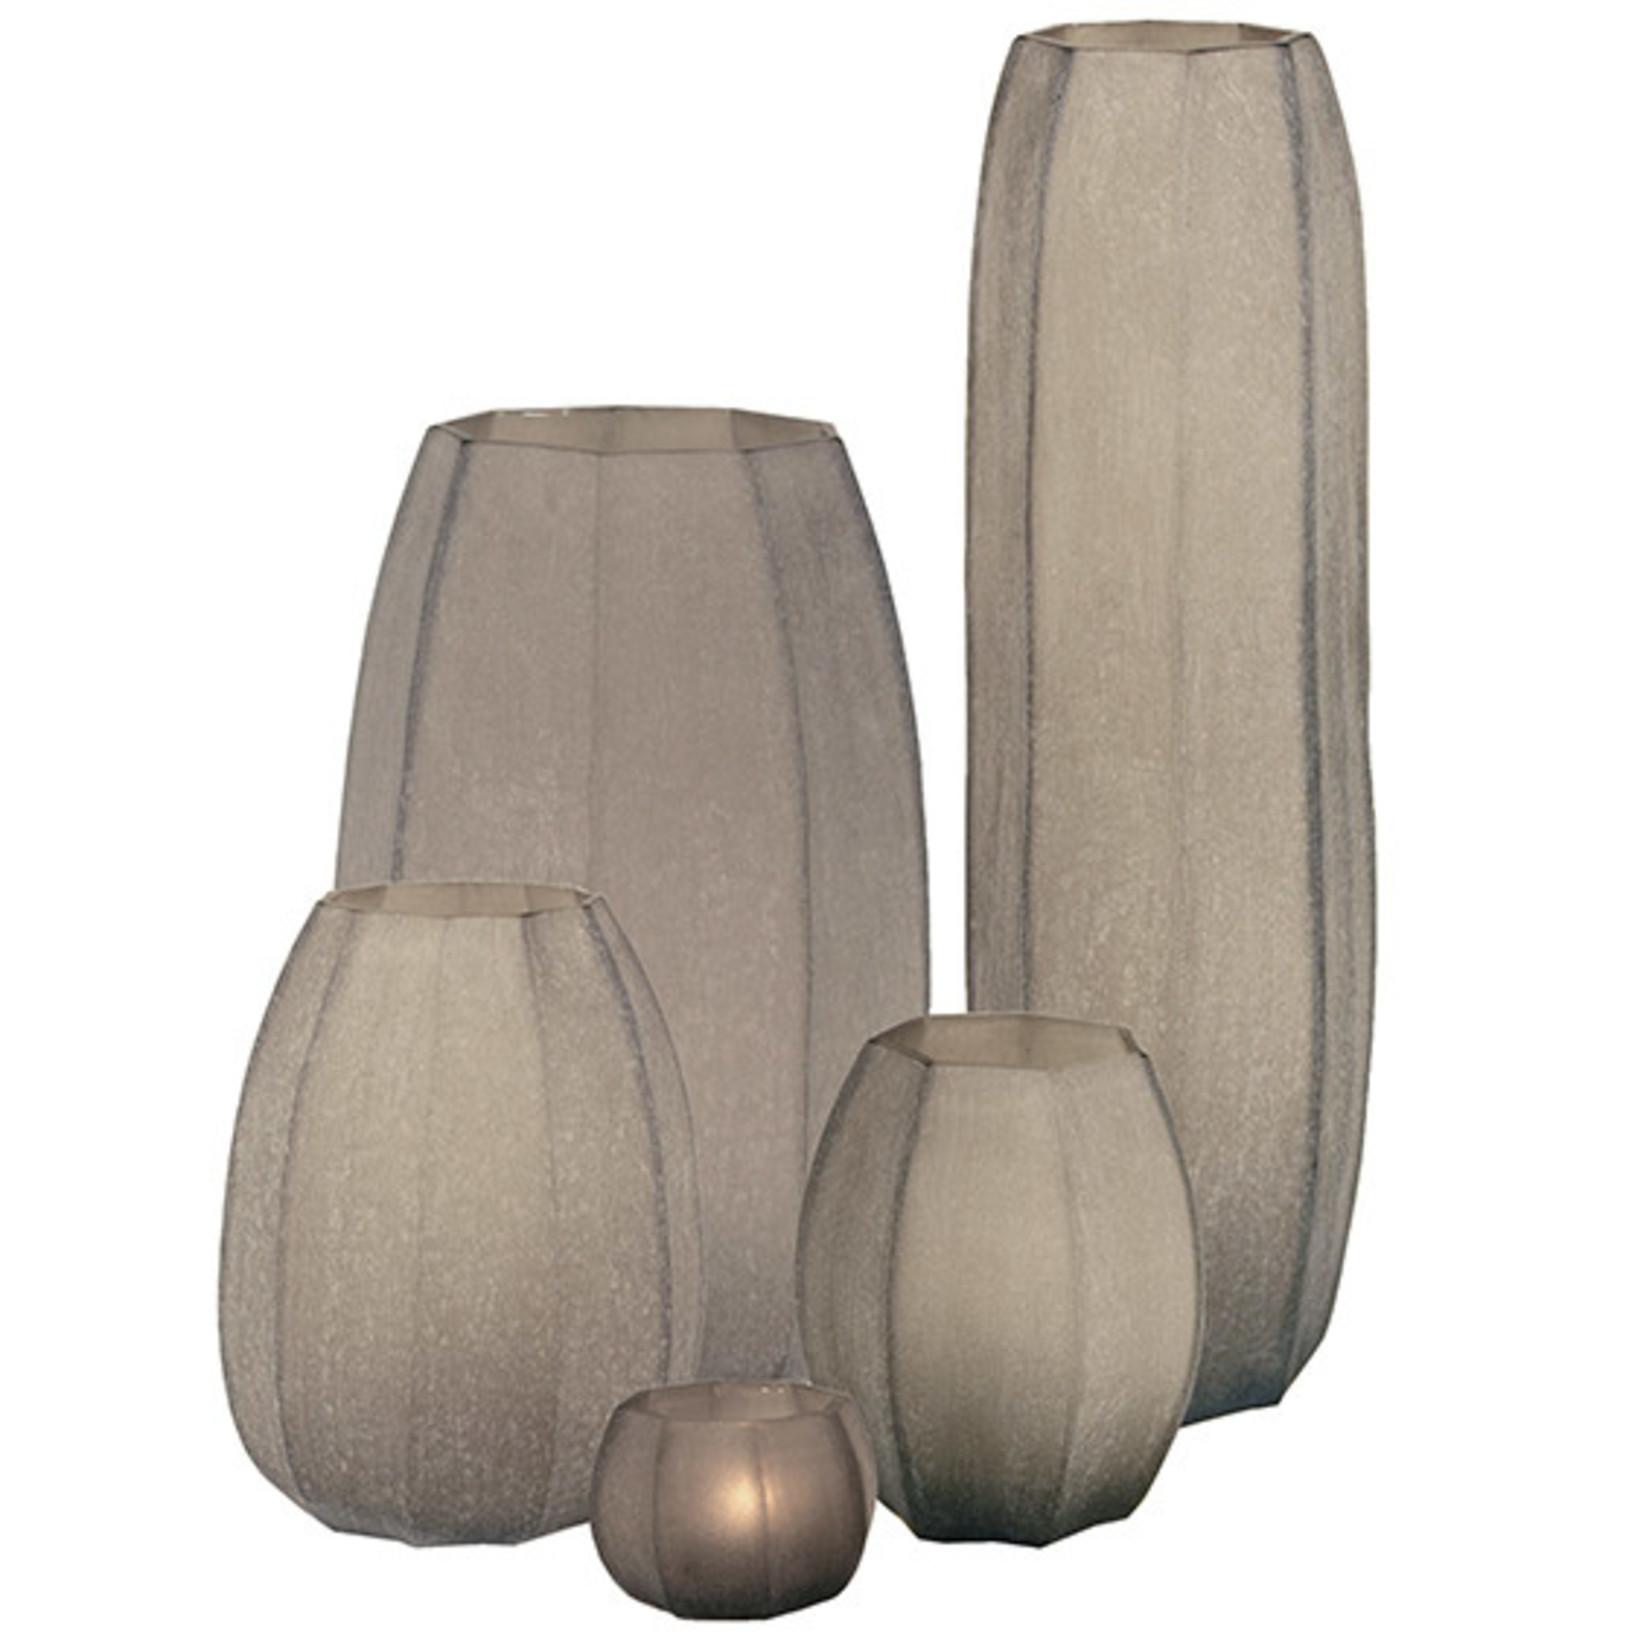 Guaxs Tea light holder Koonam | smoke grey